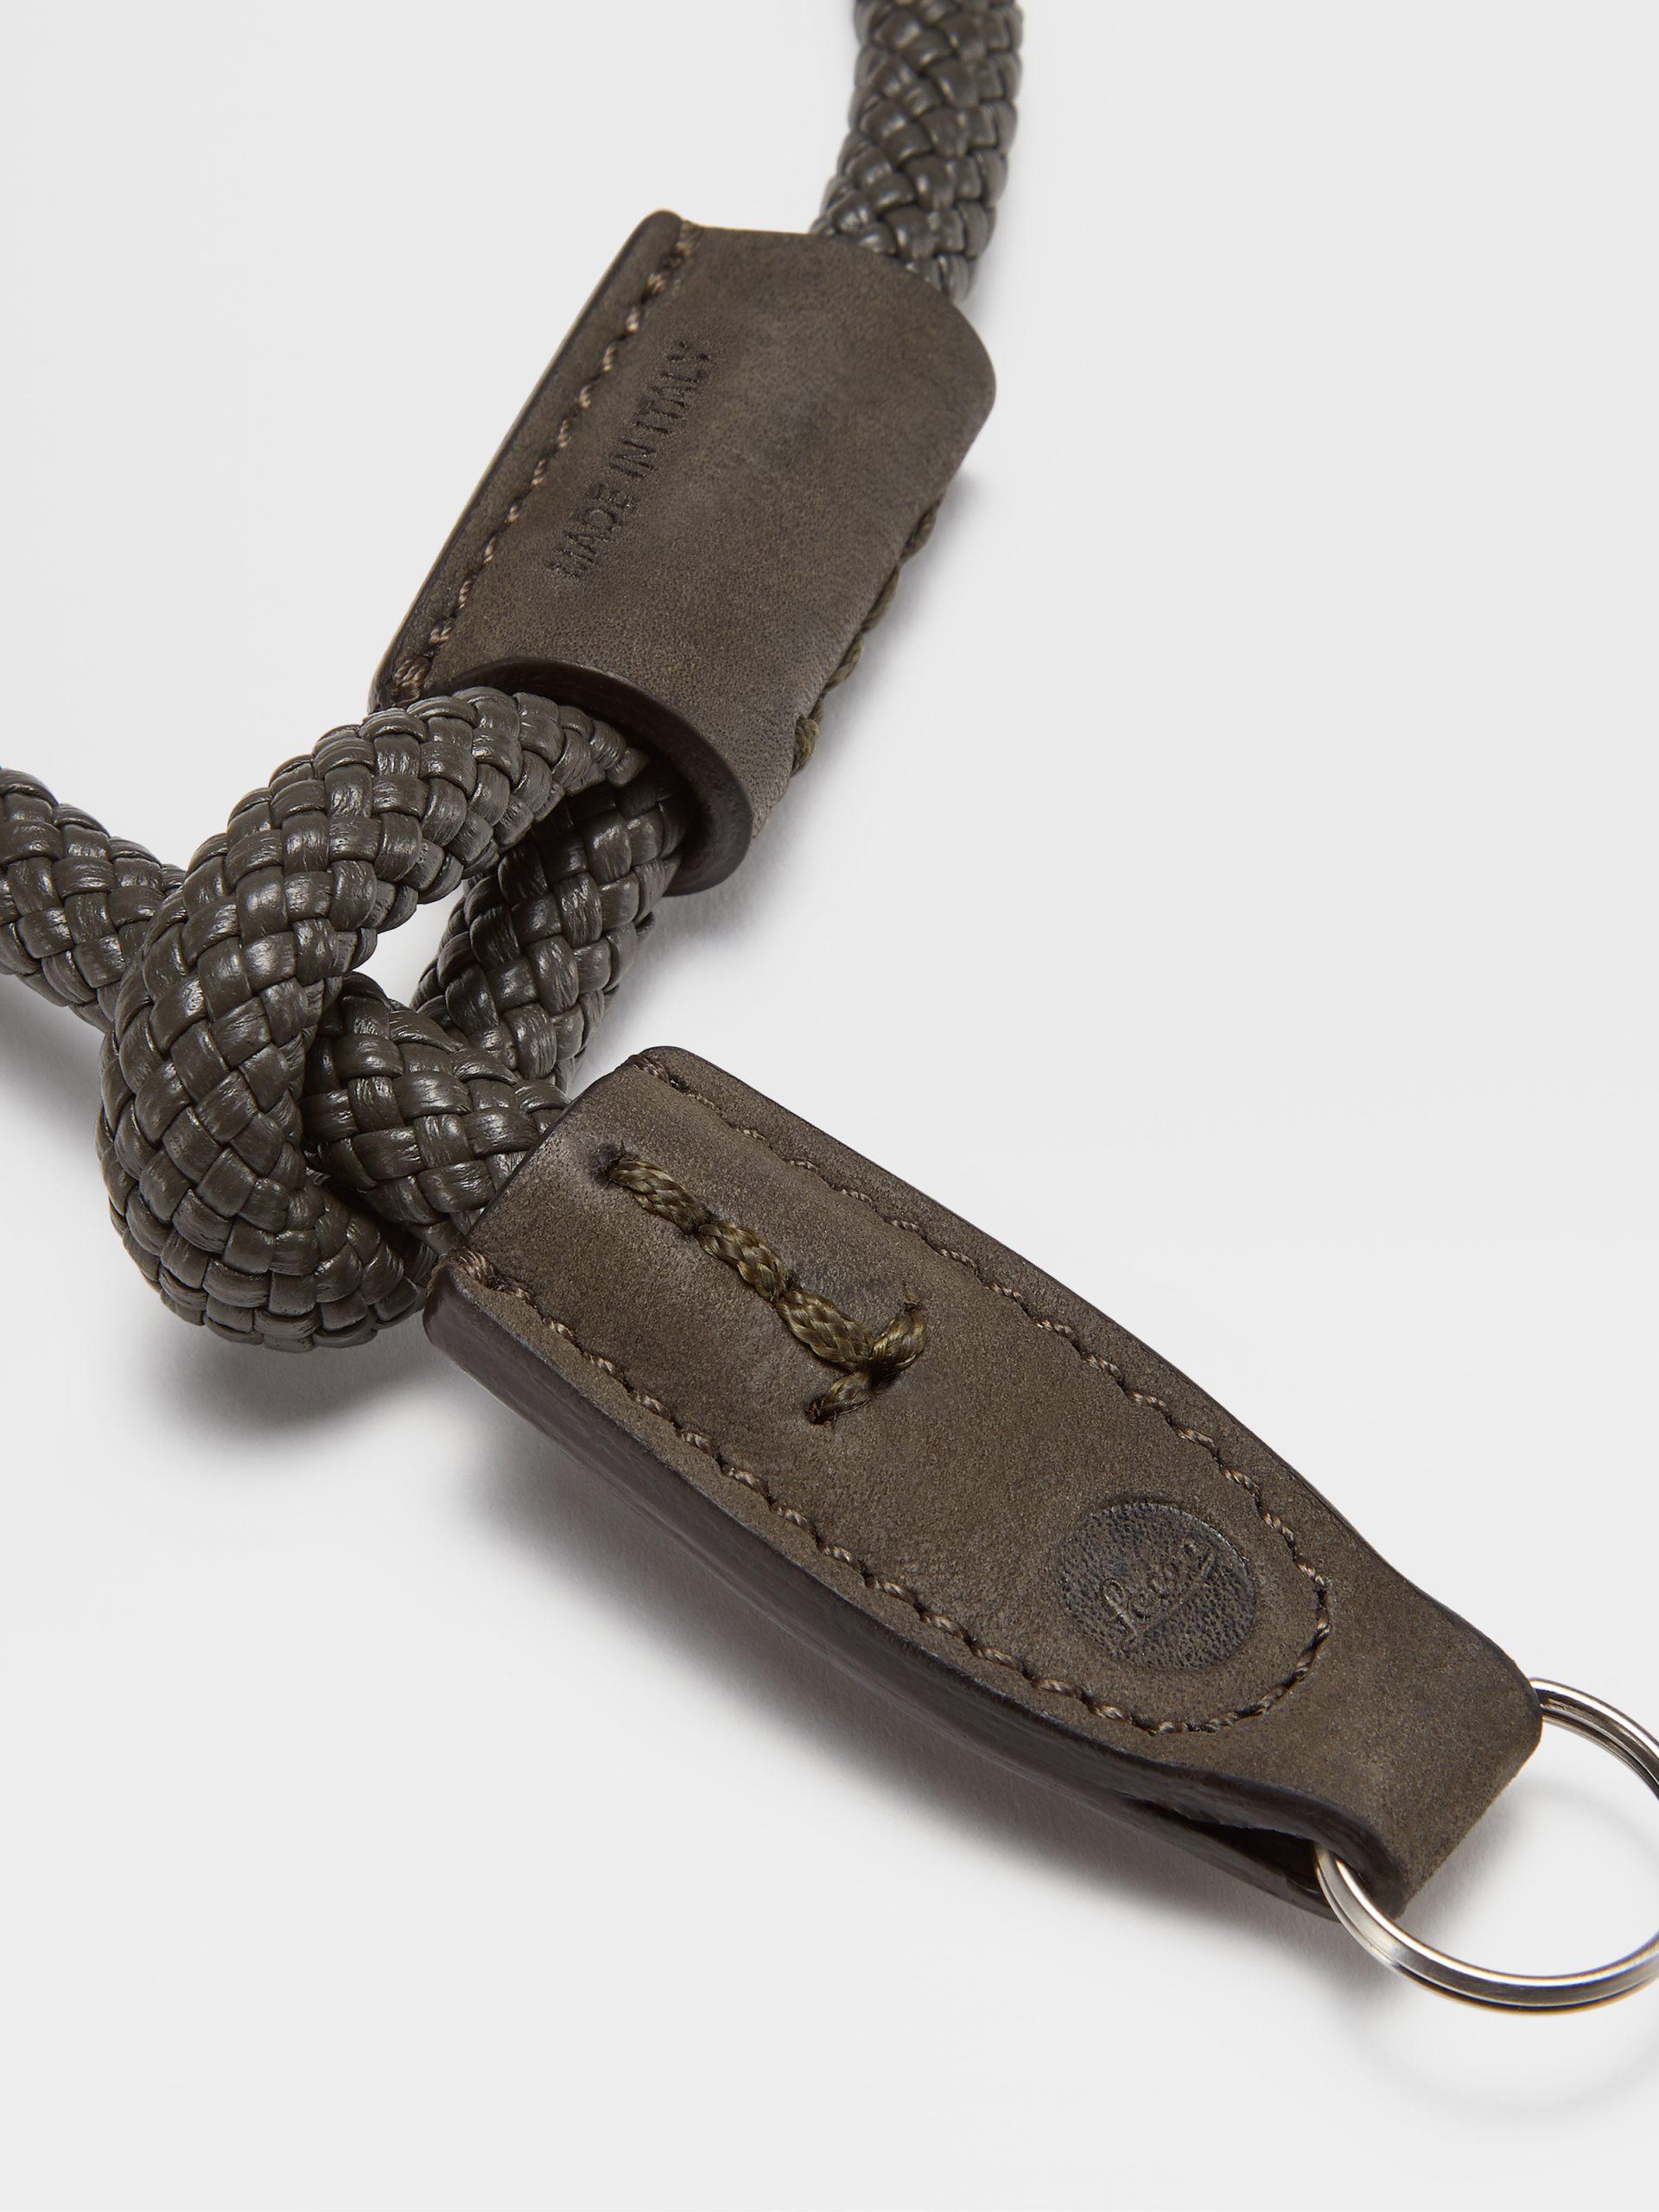 LEICA | ZEGNA Wrist Strap, Loden